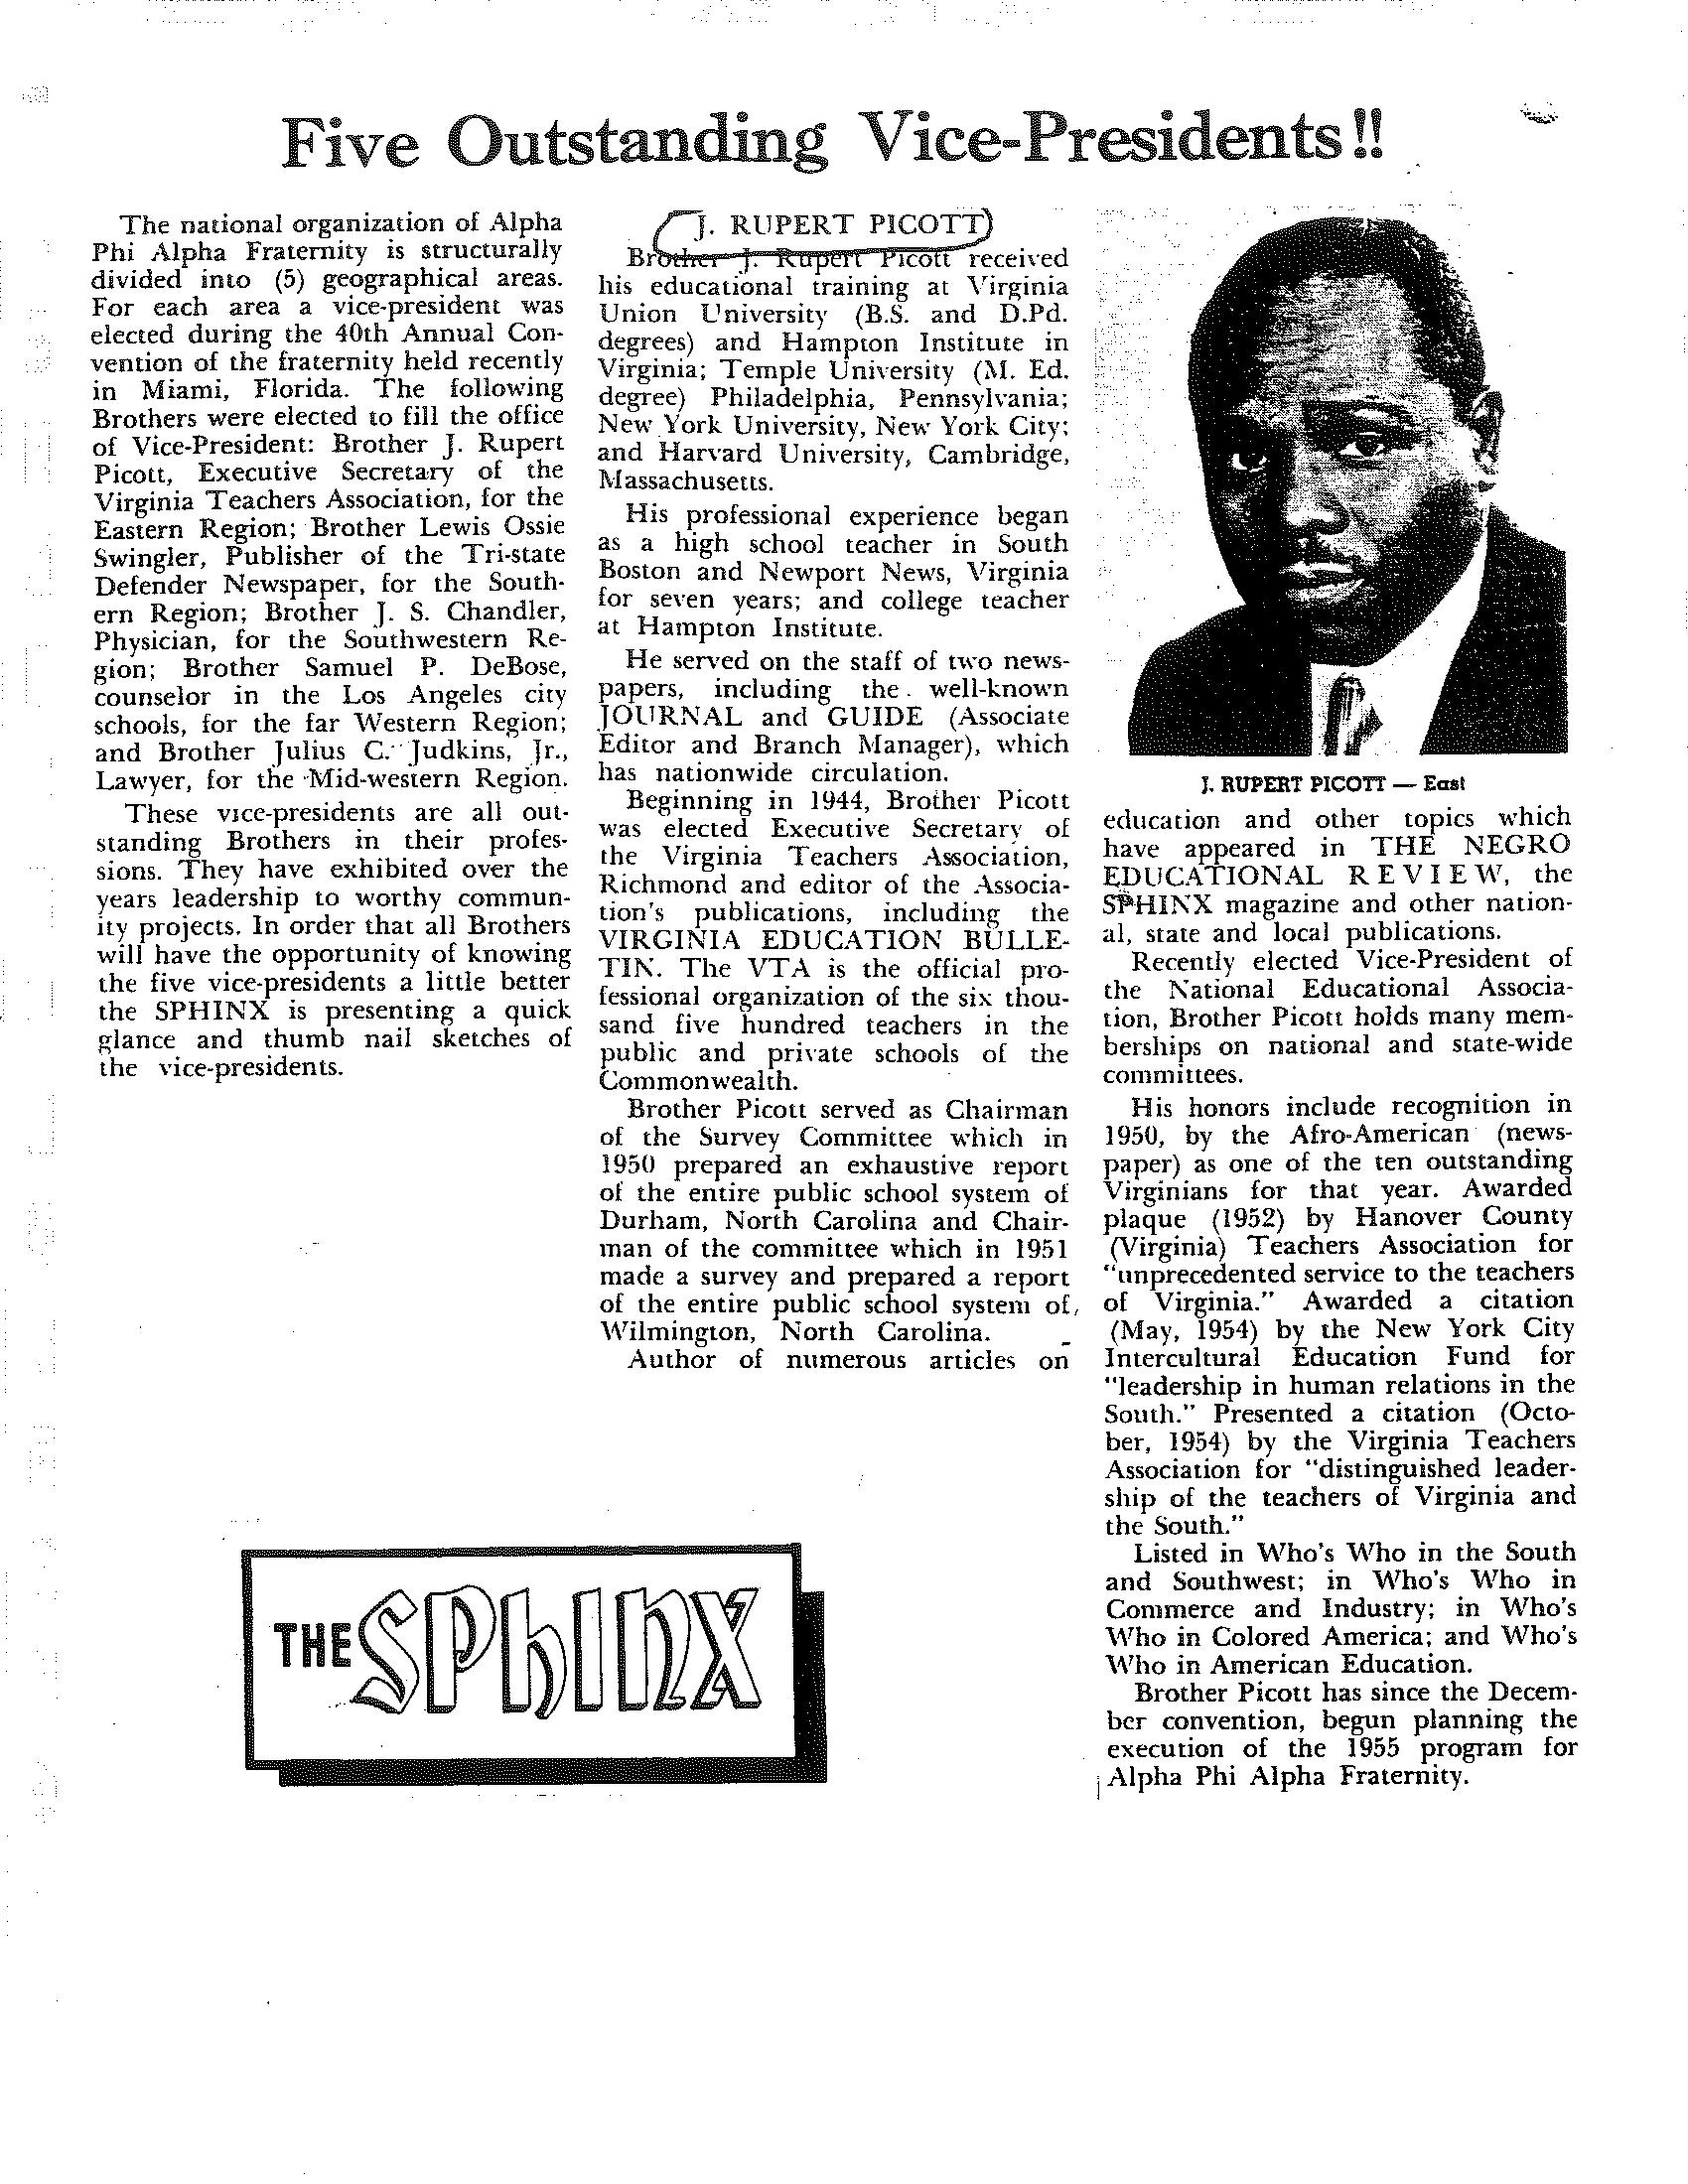 Zeta Lambda 1955 - Bro. J. Rupert Picott ERVP.png